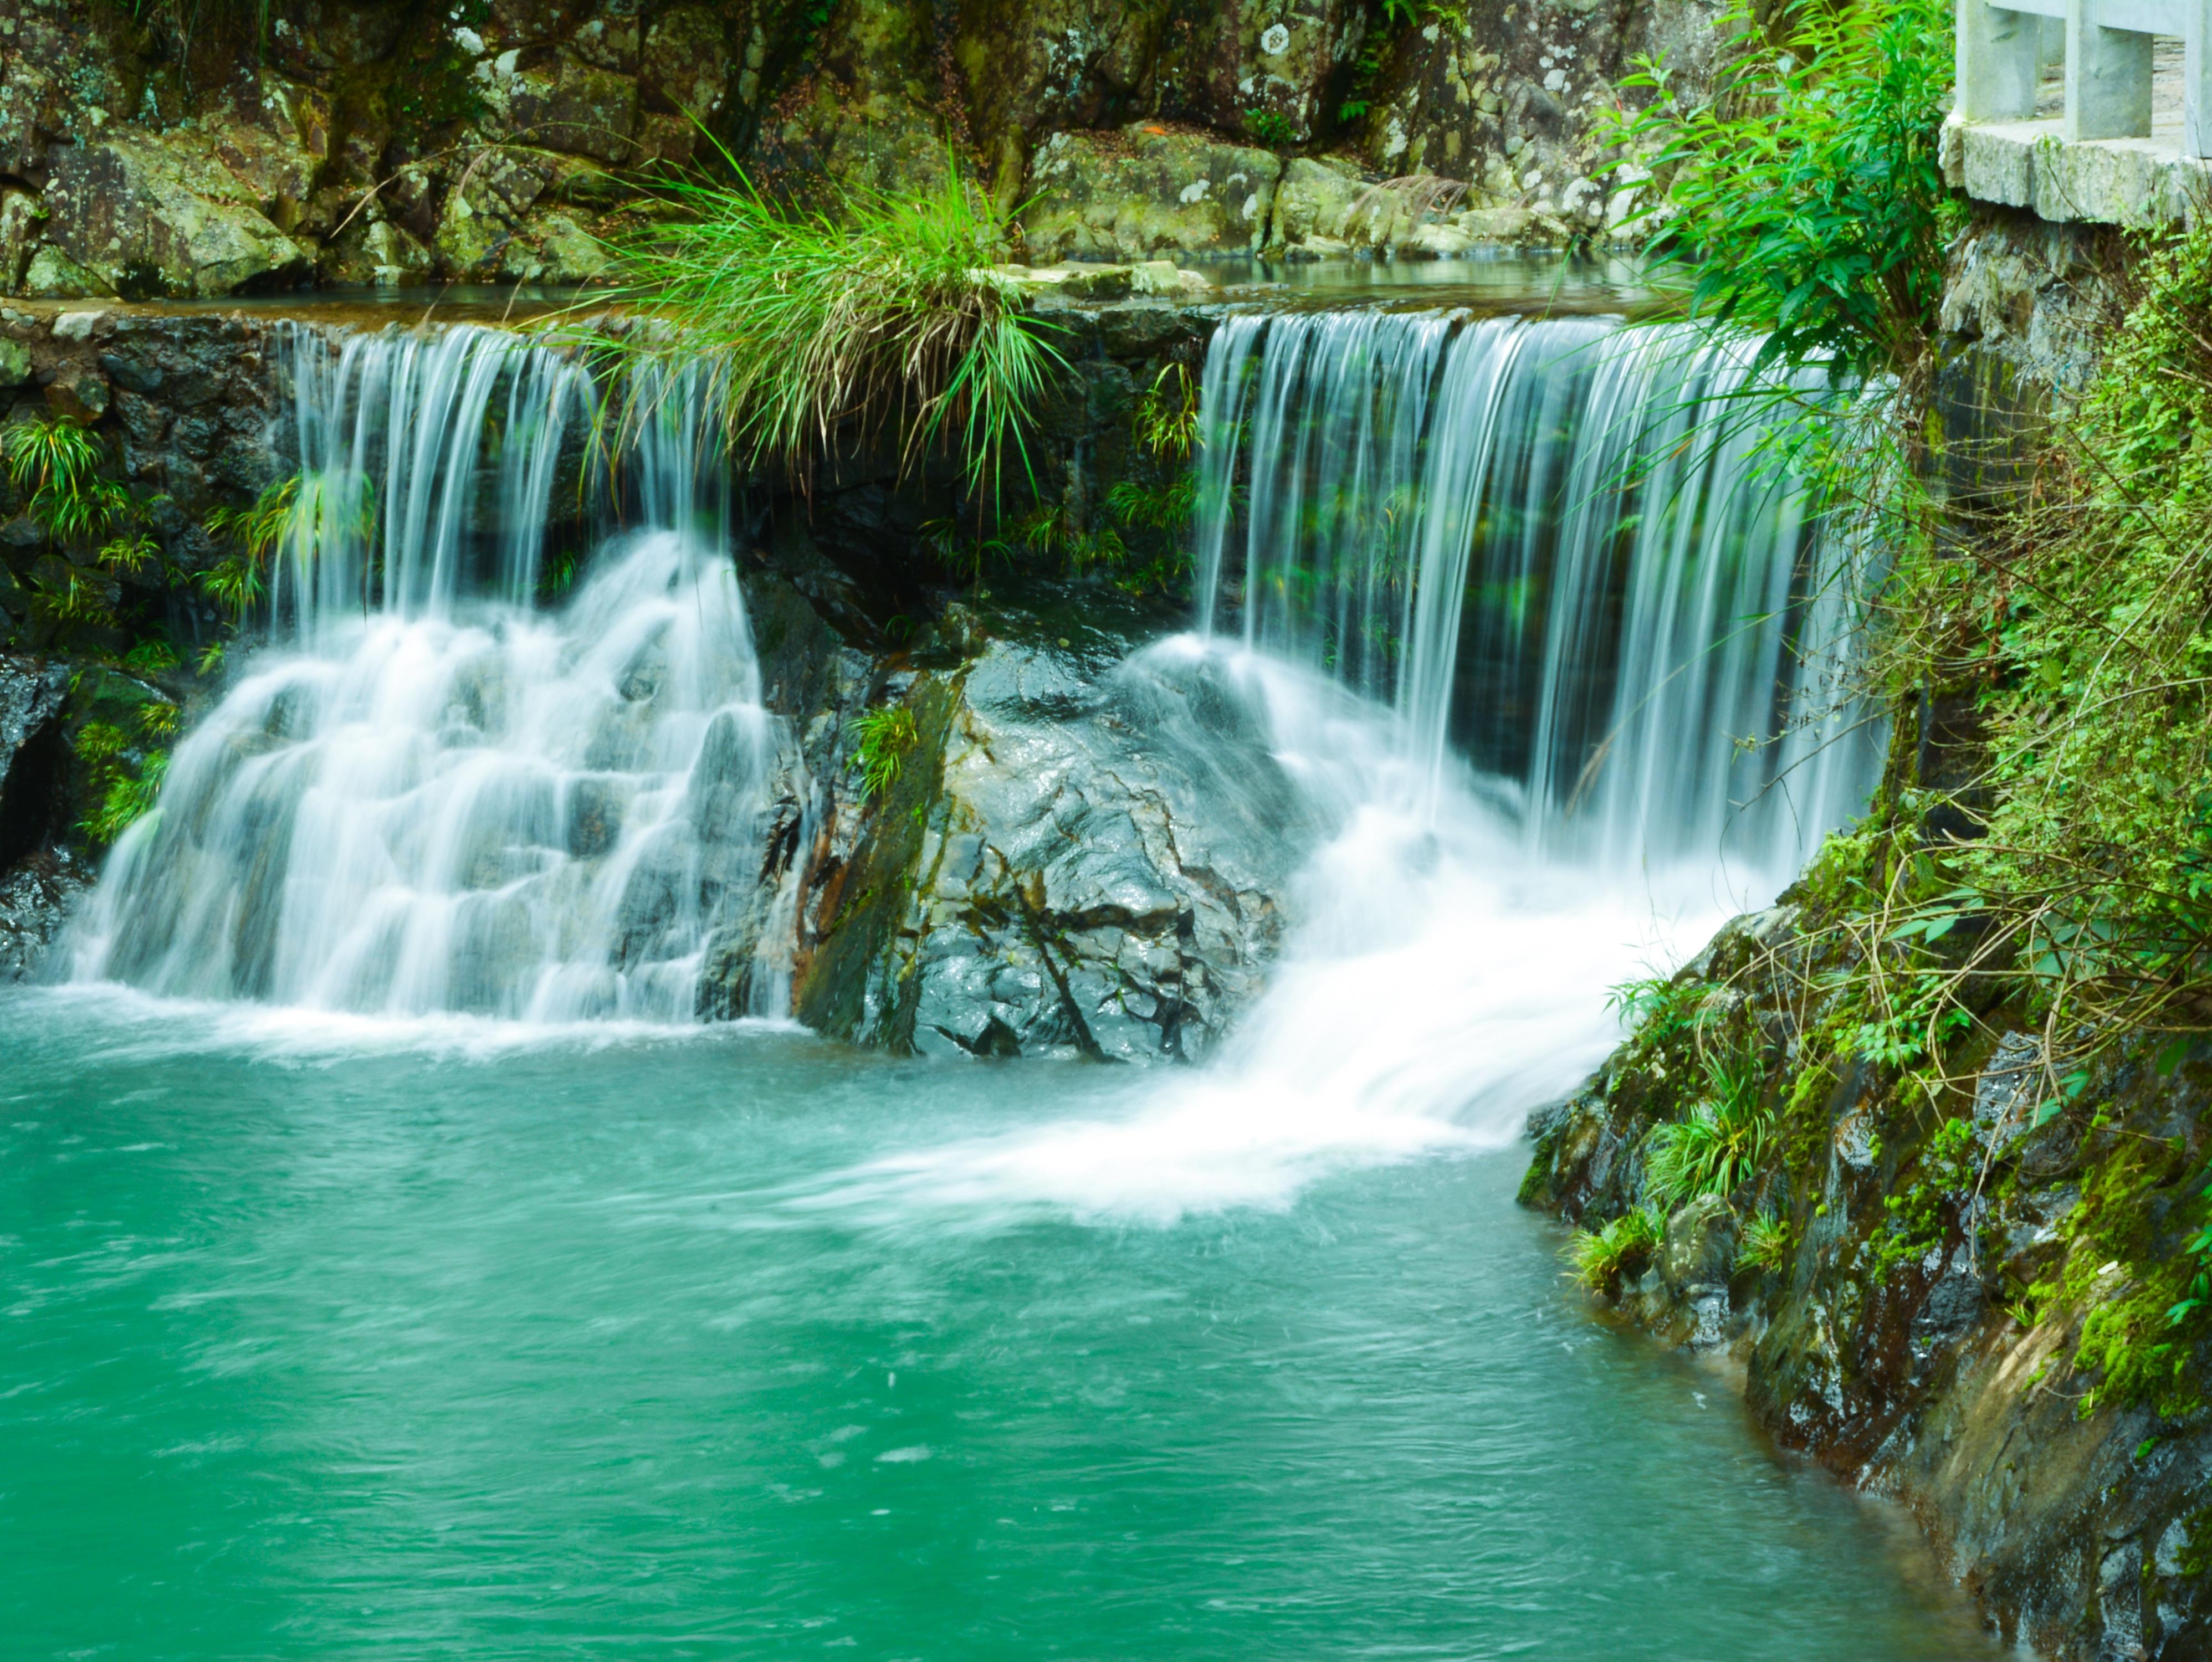 Zhai liao creek falls running water brooks